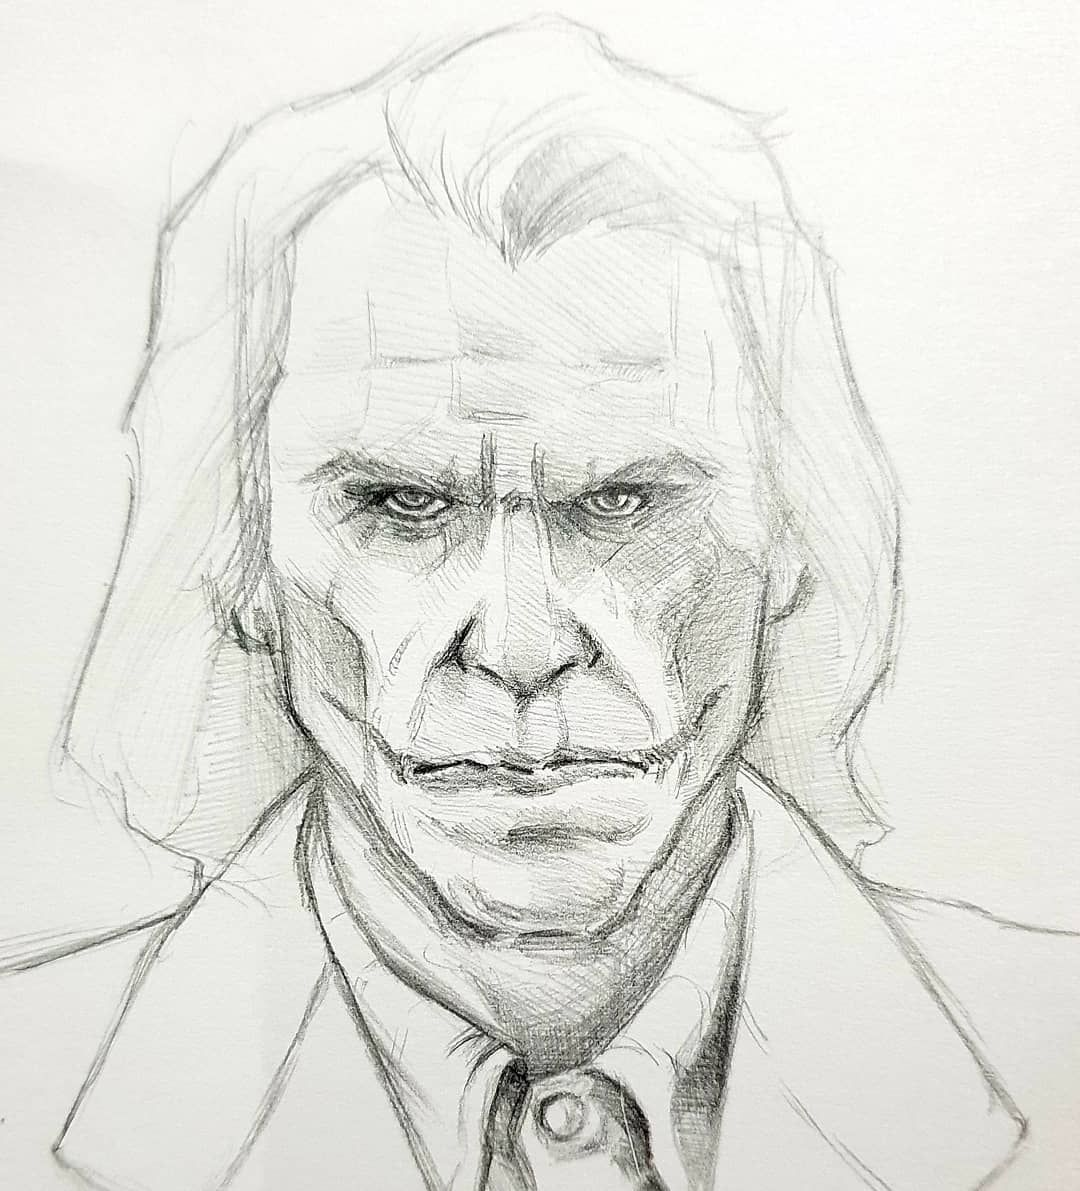 #joker # batman #arkhamasylum #dc #drawing #art #sketch #pencil #boredaf